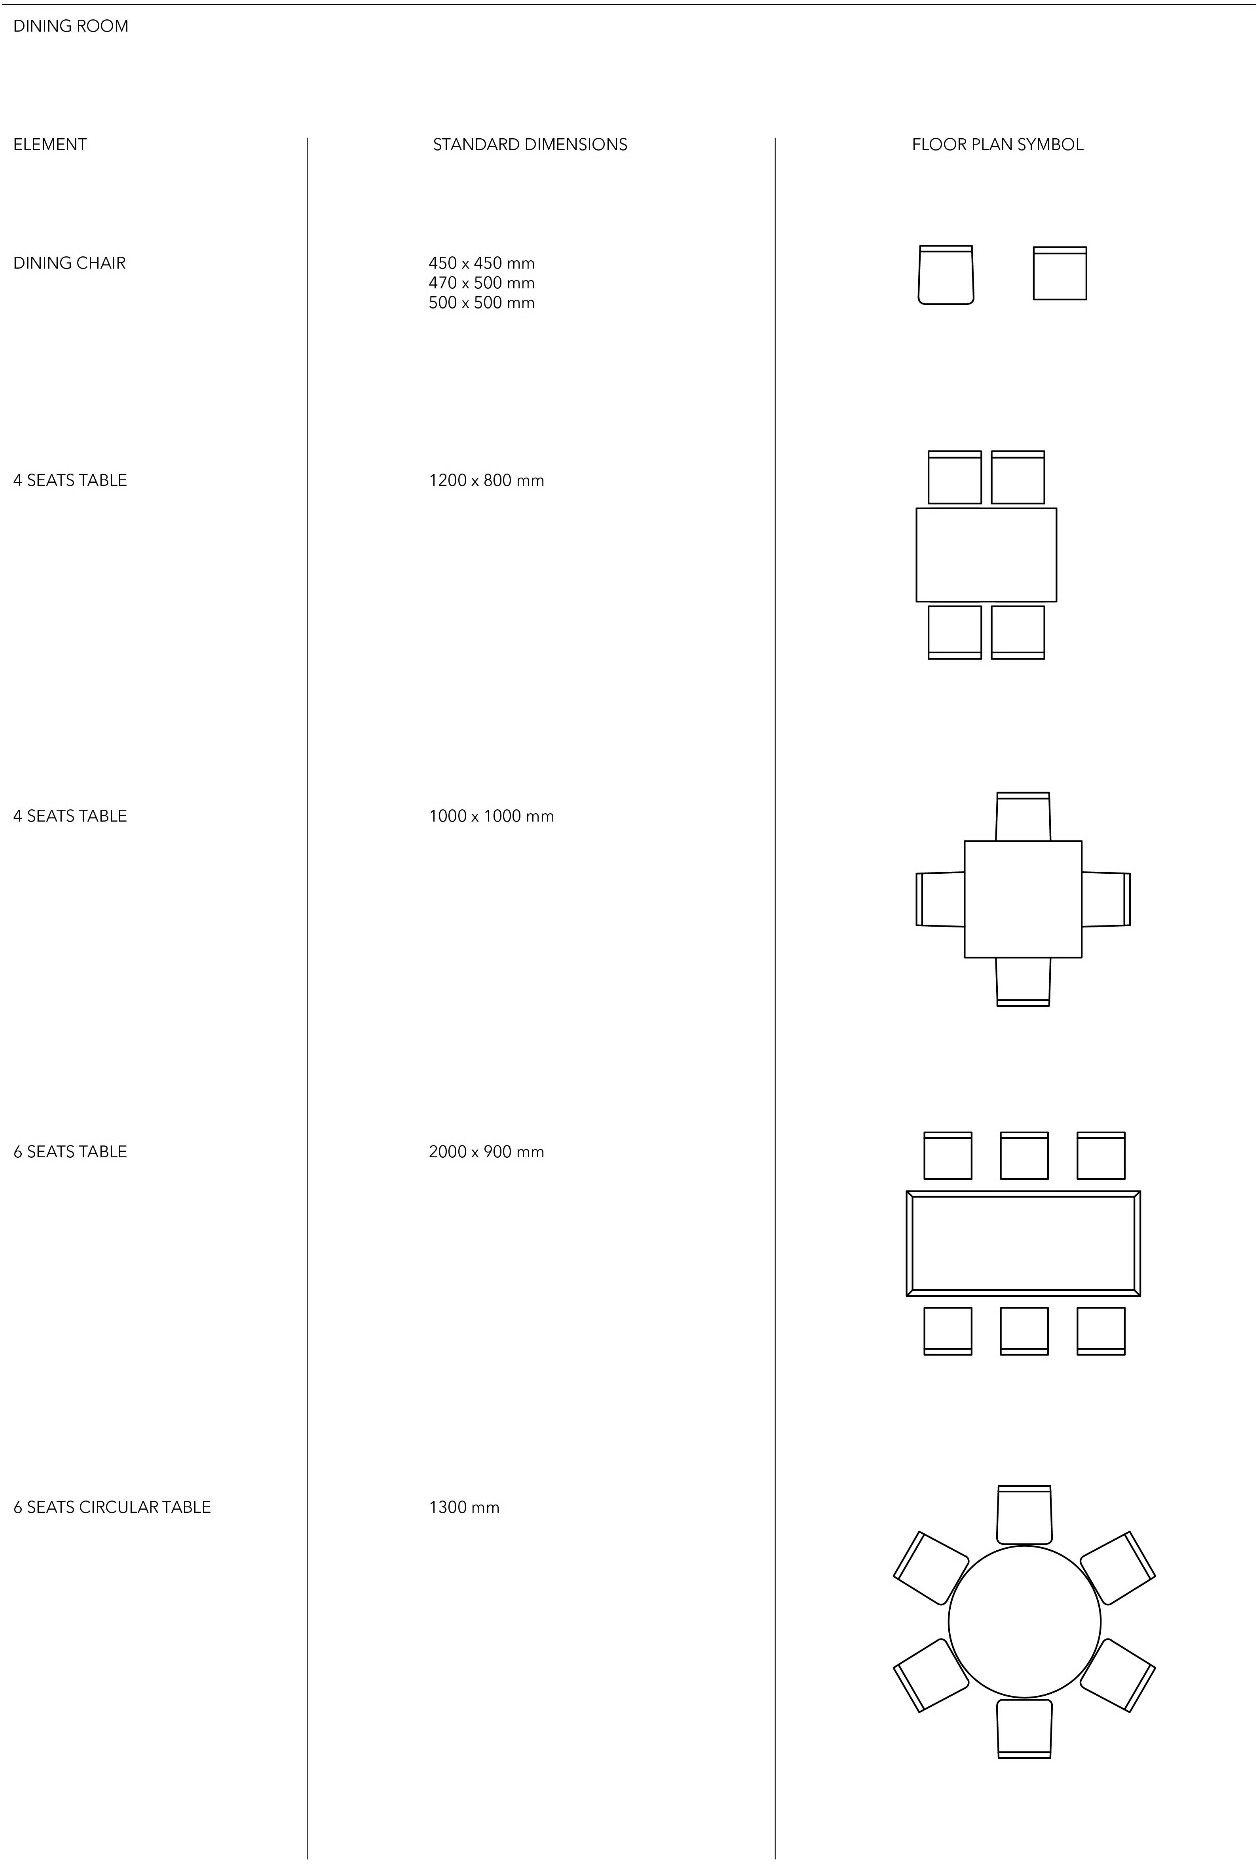 Fine Floor Plan View Furniture Symbols In 2019 Floor Plan Creativecarmelina Interior Chair Design Creativecarmelinacom